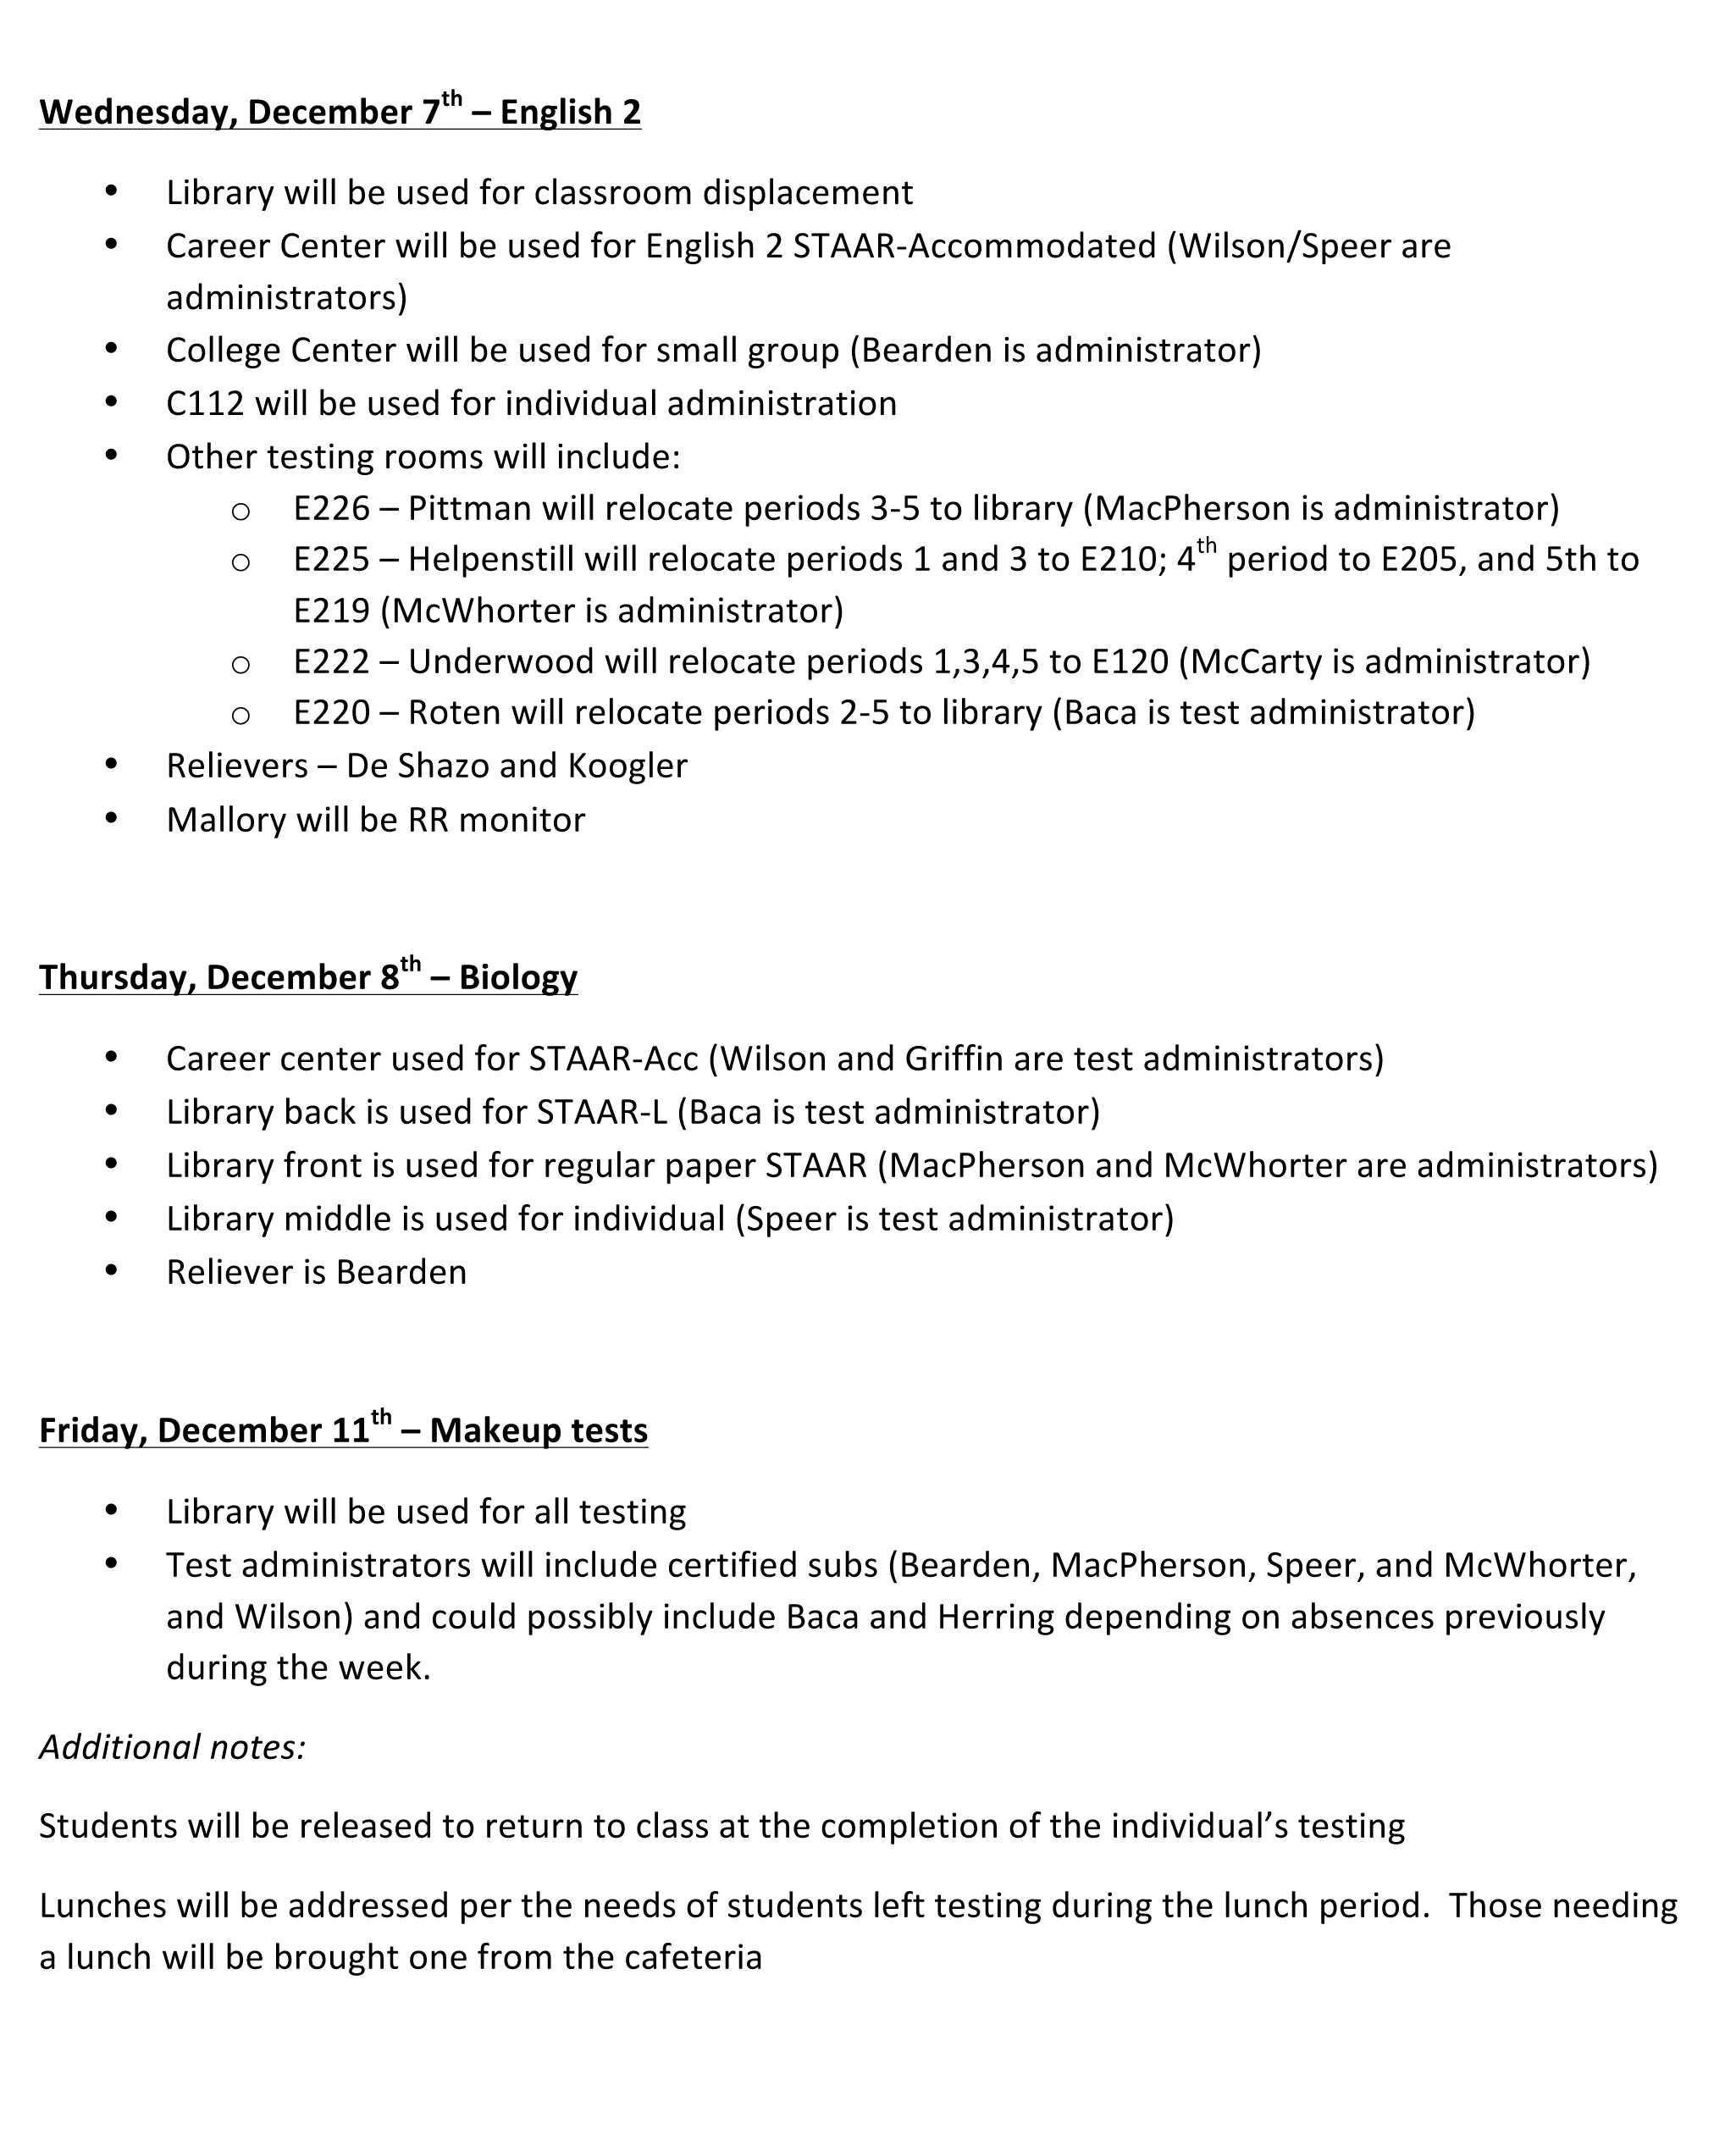 Microsoft Word - December Testing Plan.docx